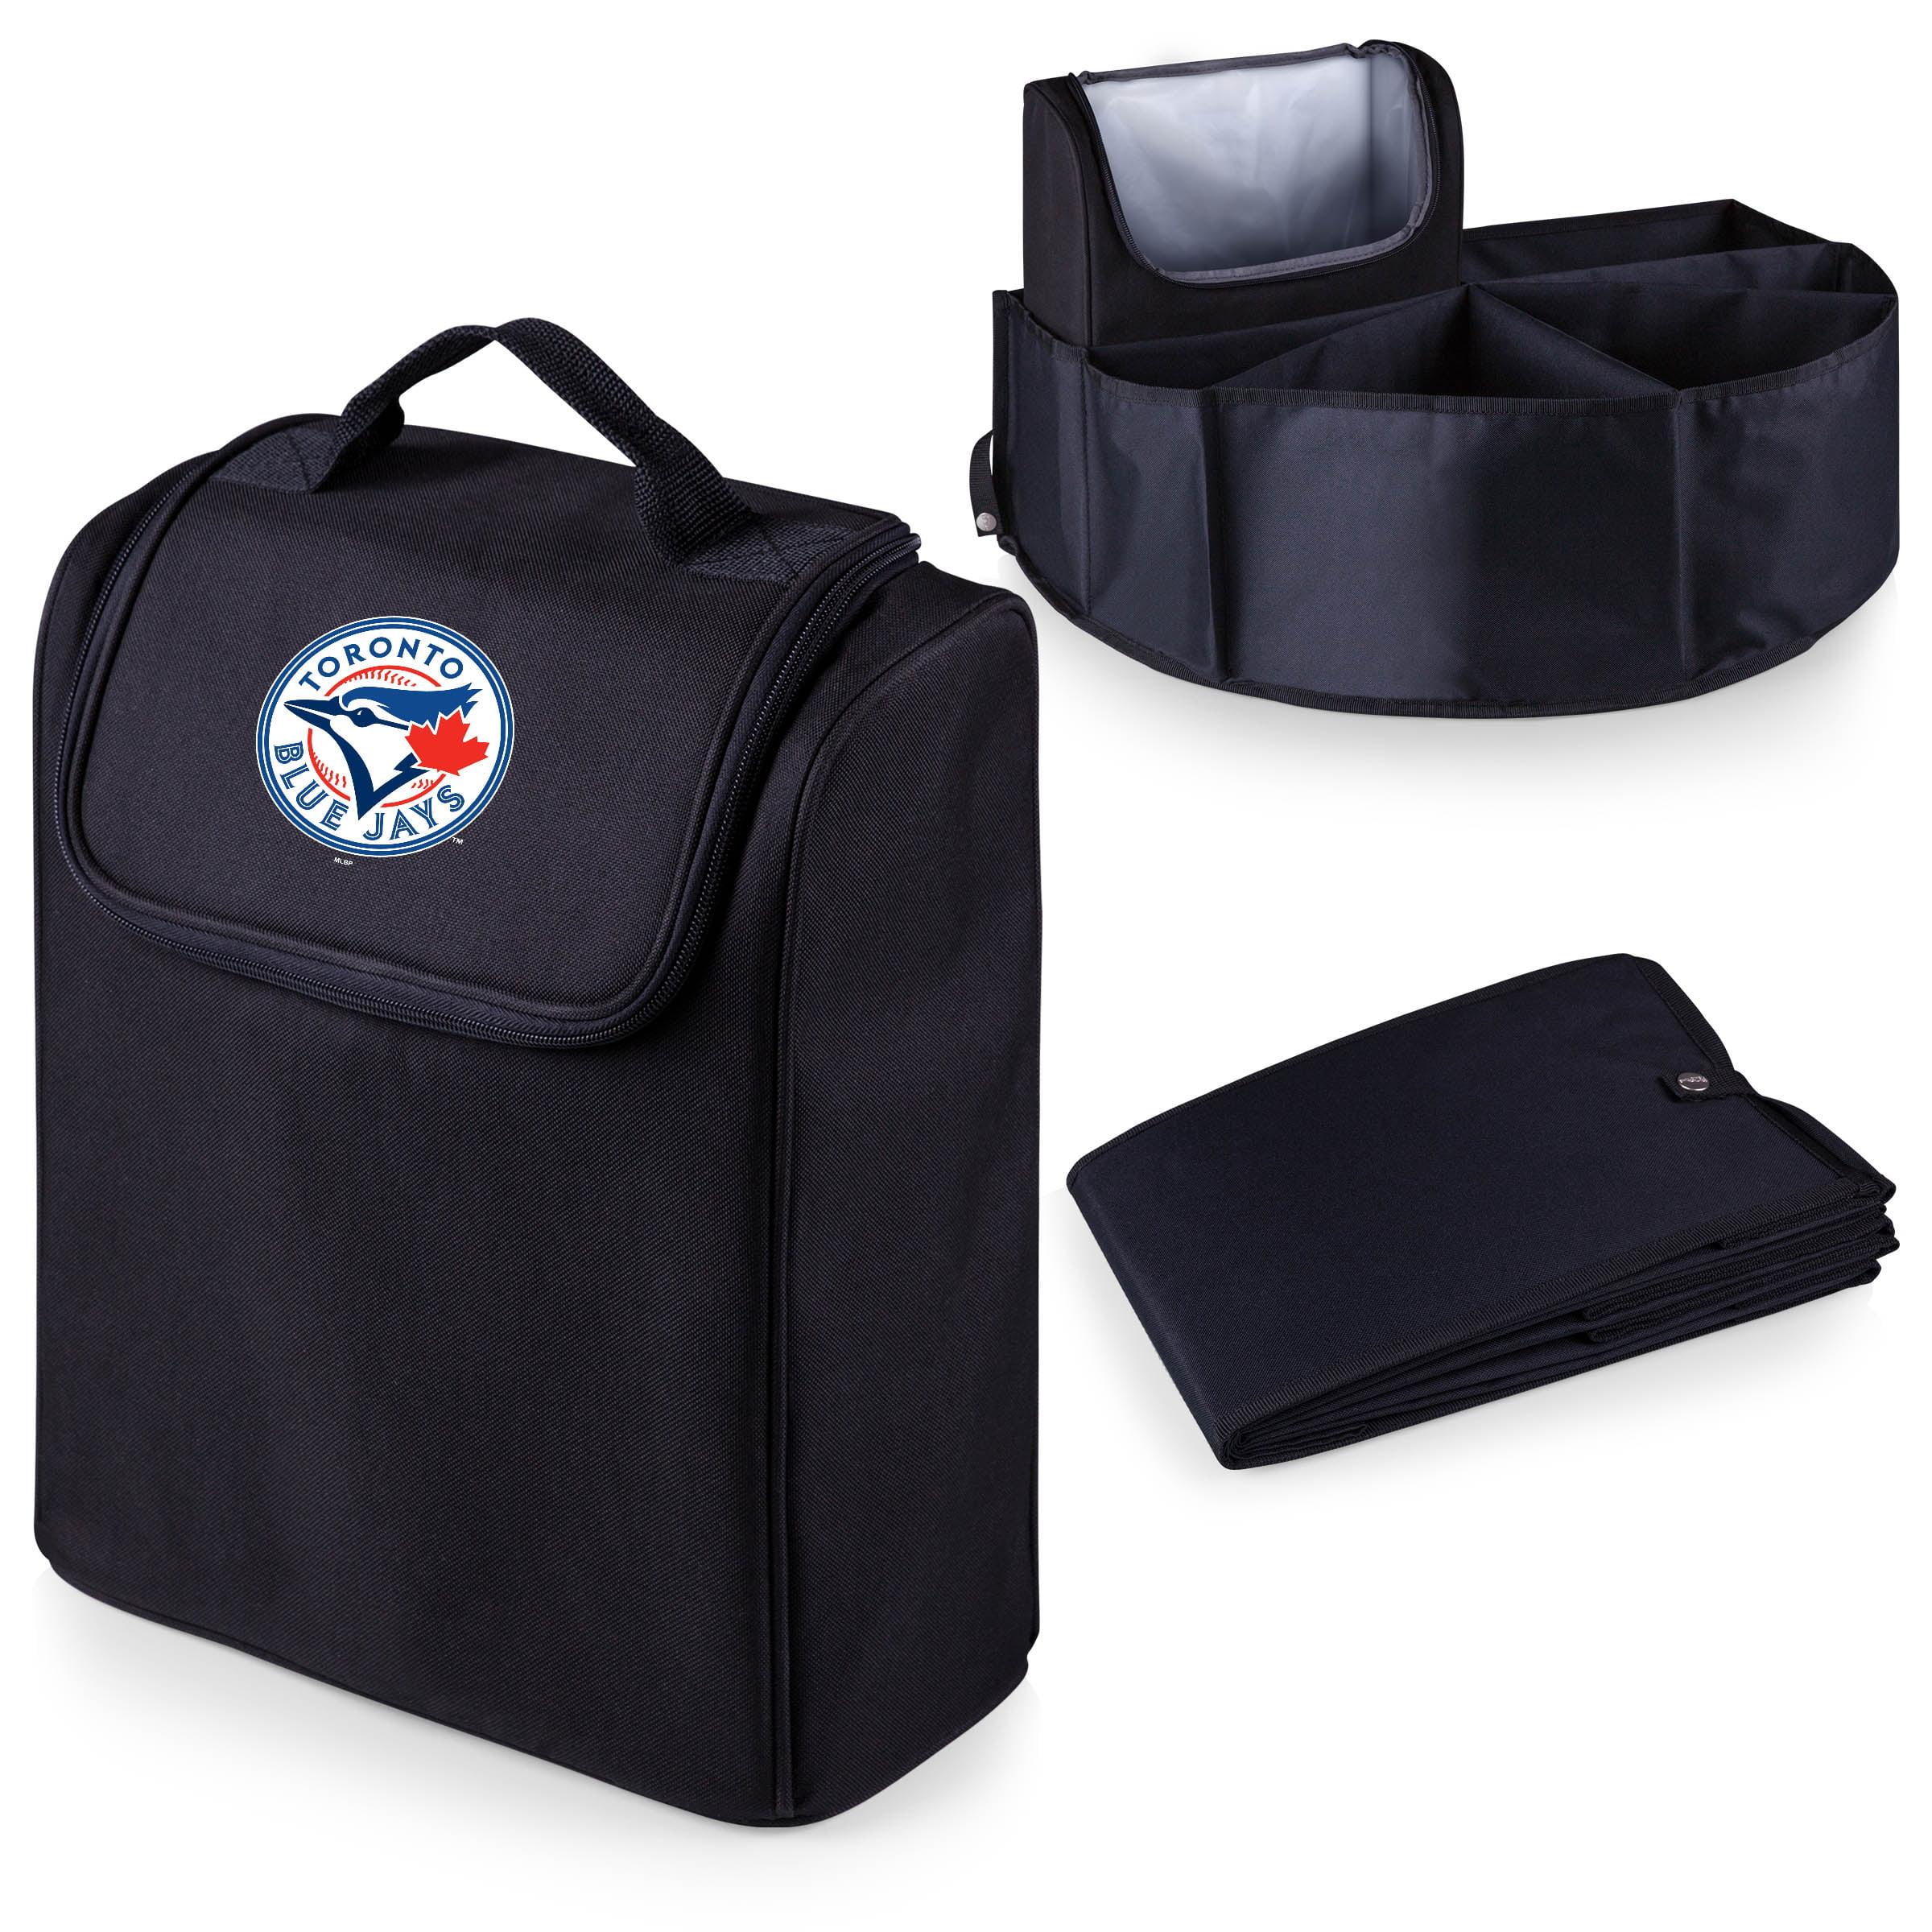 Toronto Blue Jays Trunk Boss Organizer with Cooler - Black - No Size